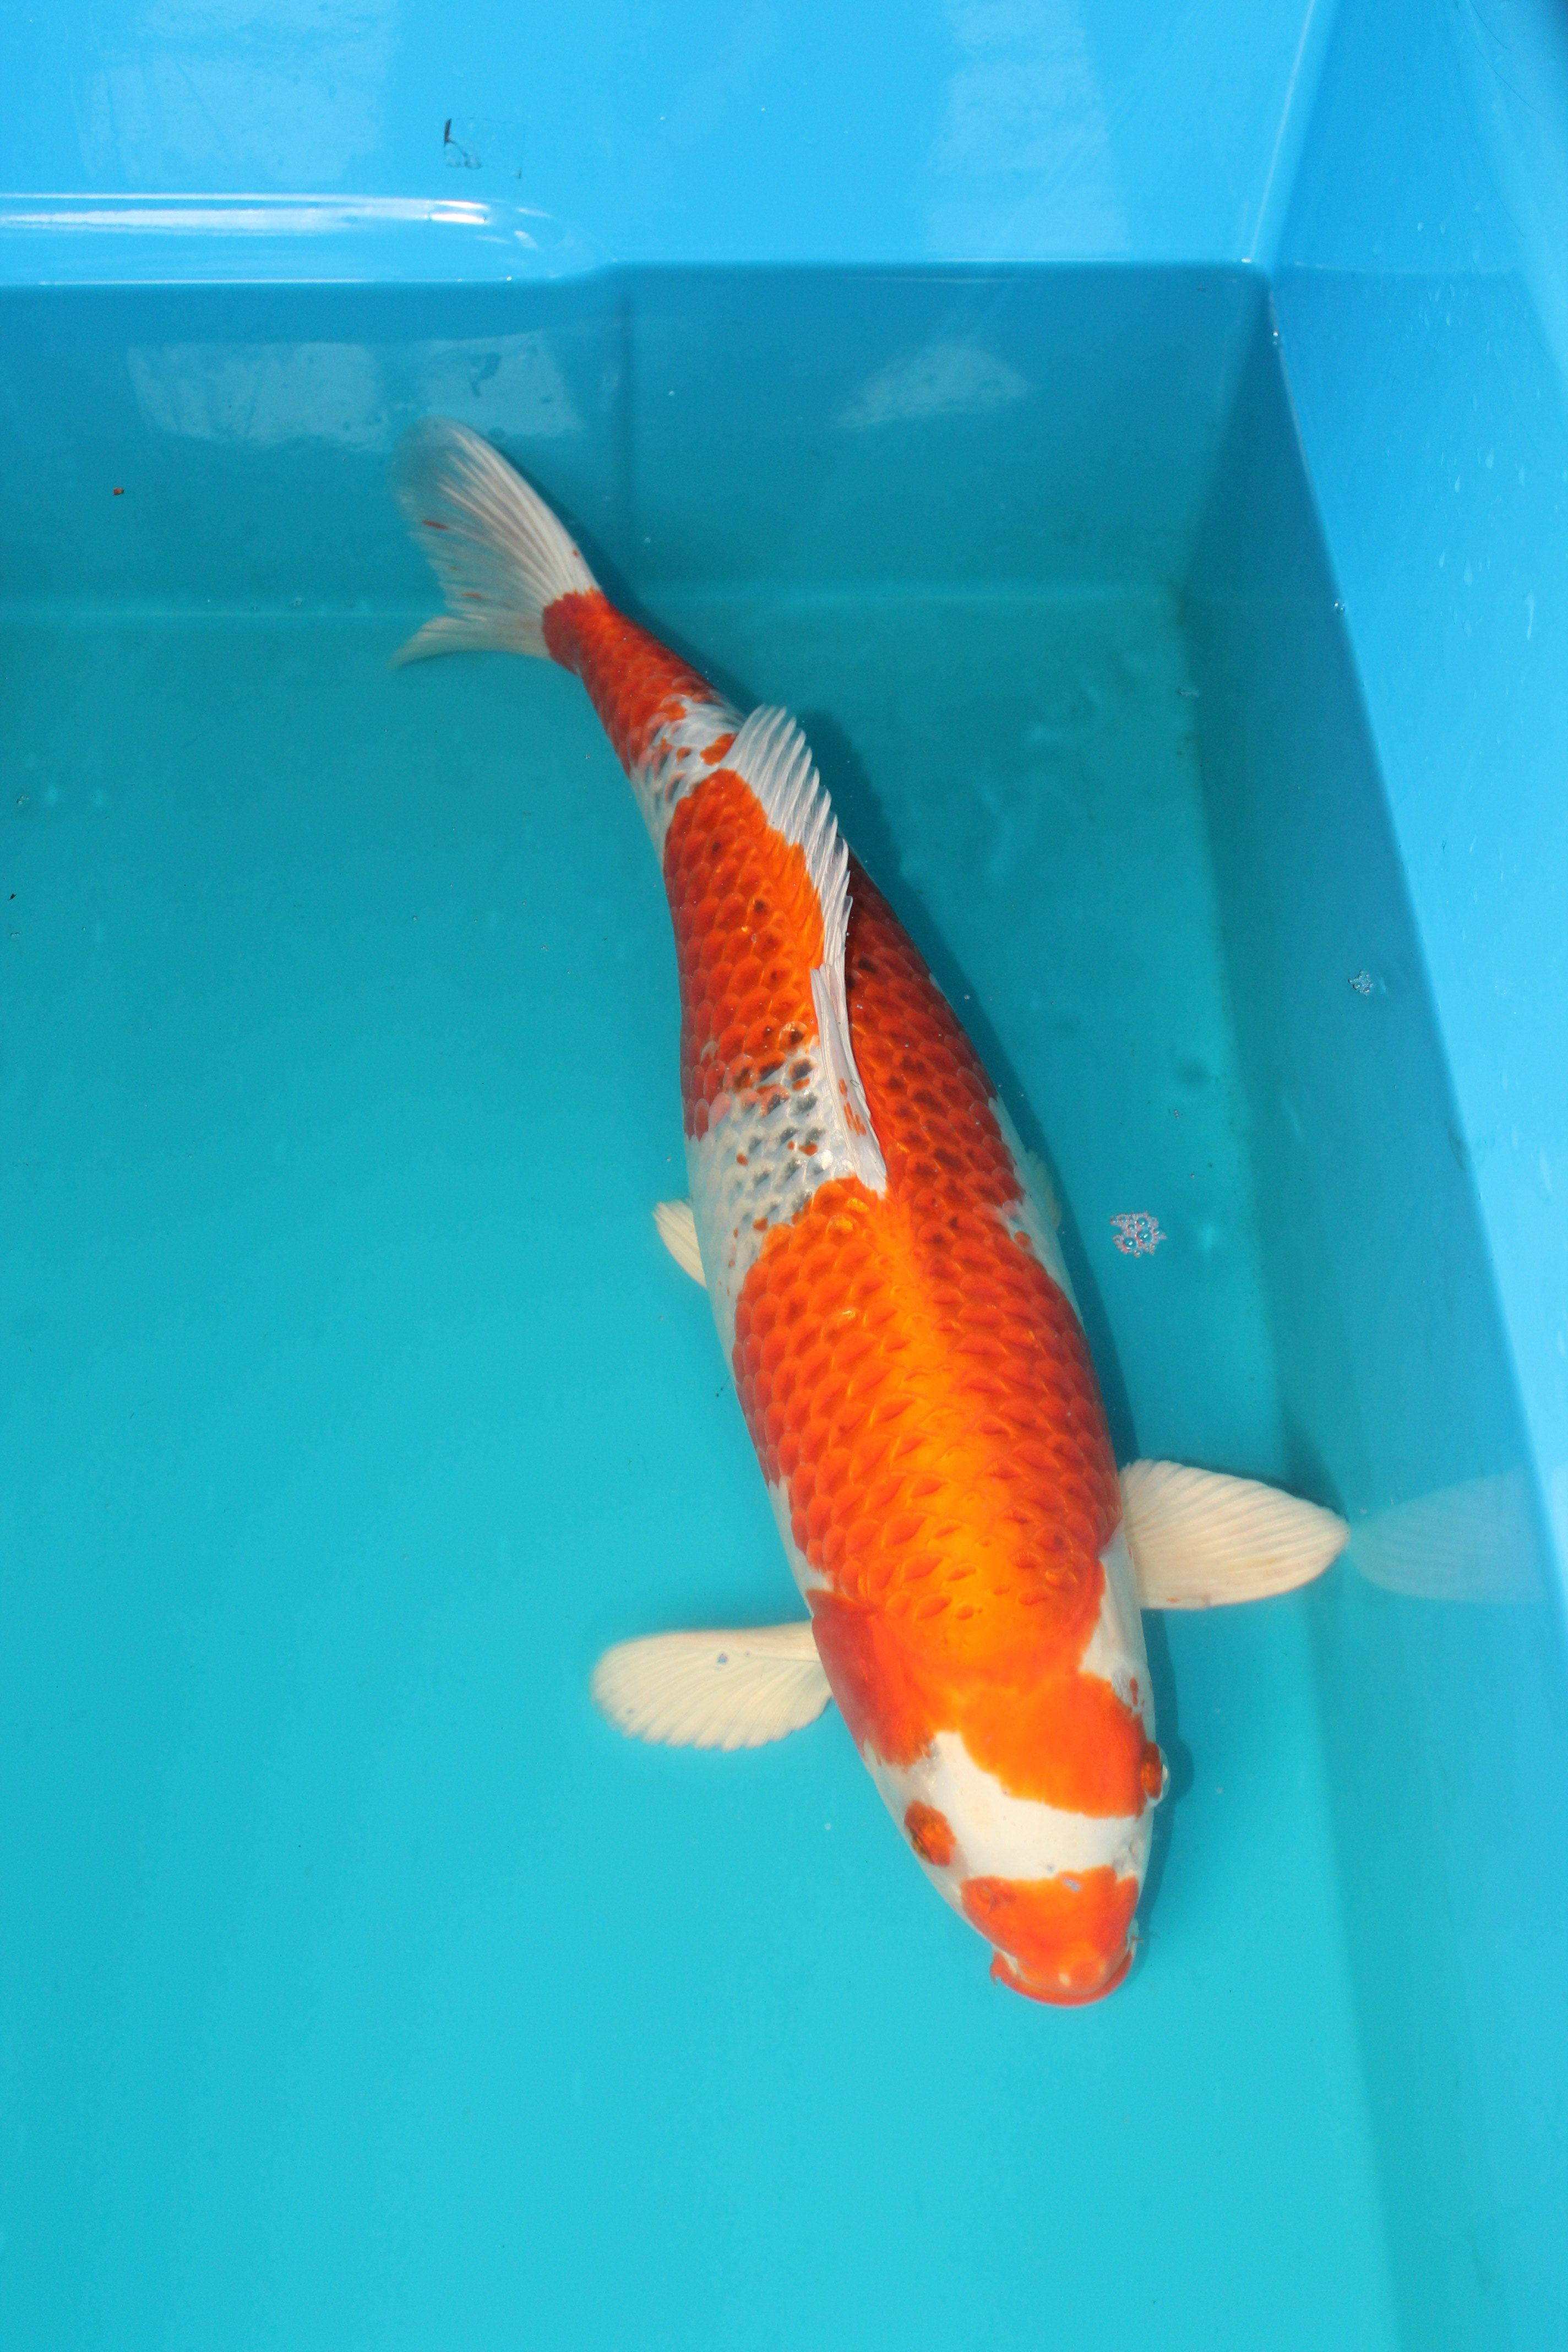 Koi For Sale Showa Koi, Koi Fish For Sale, Kohaku, Koi Carp